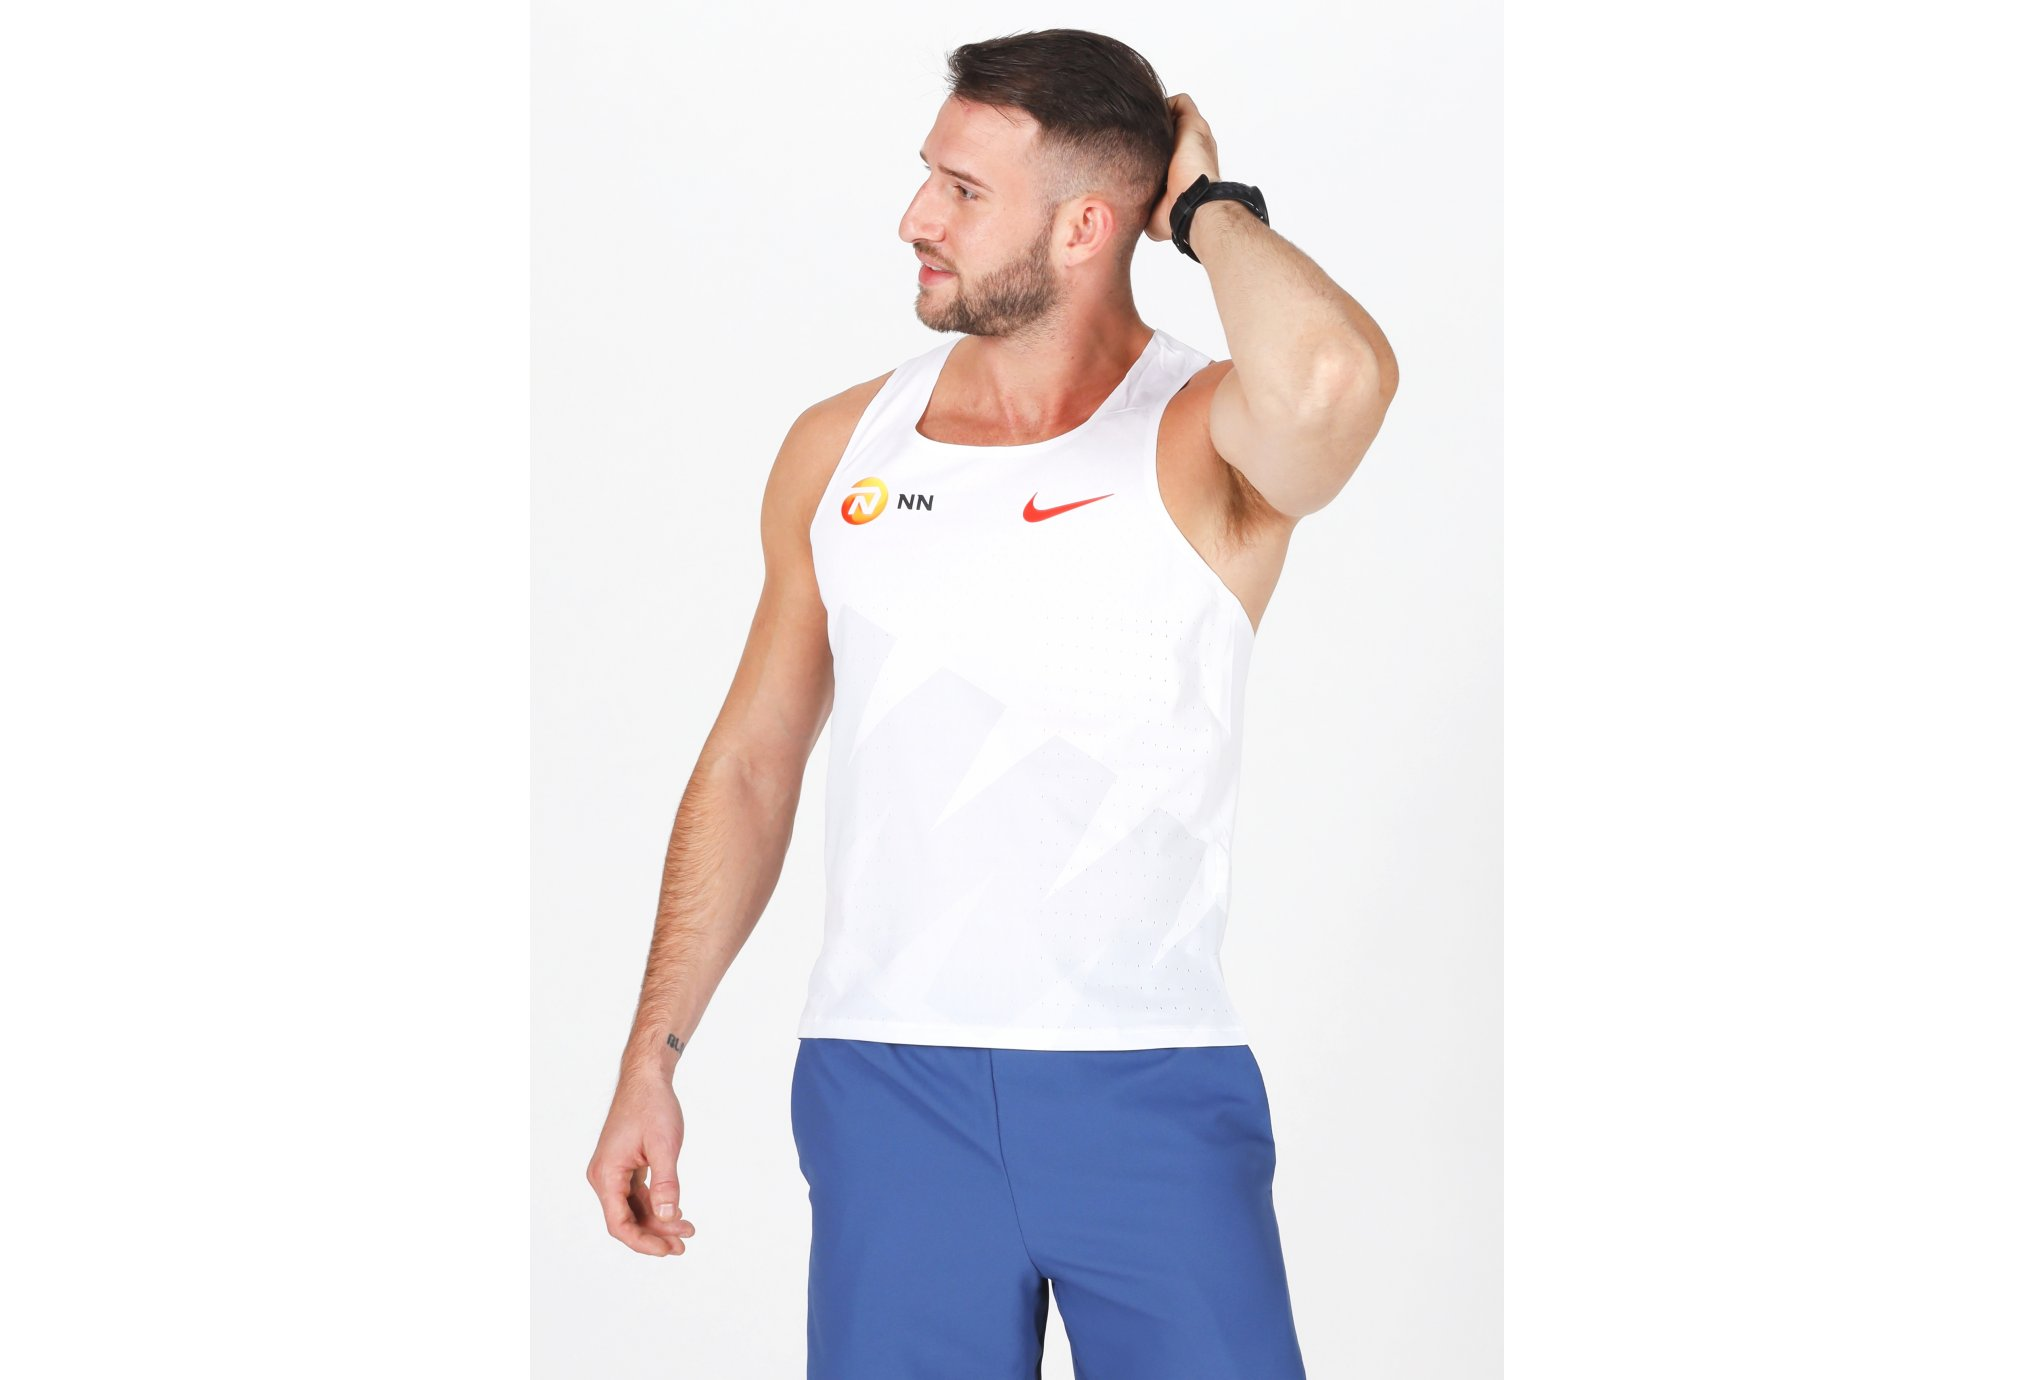 Nike AeroSwift NN M vêtement running homme